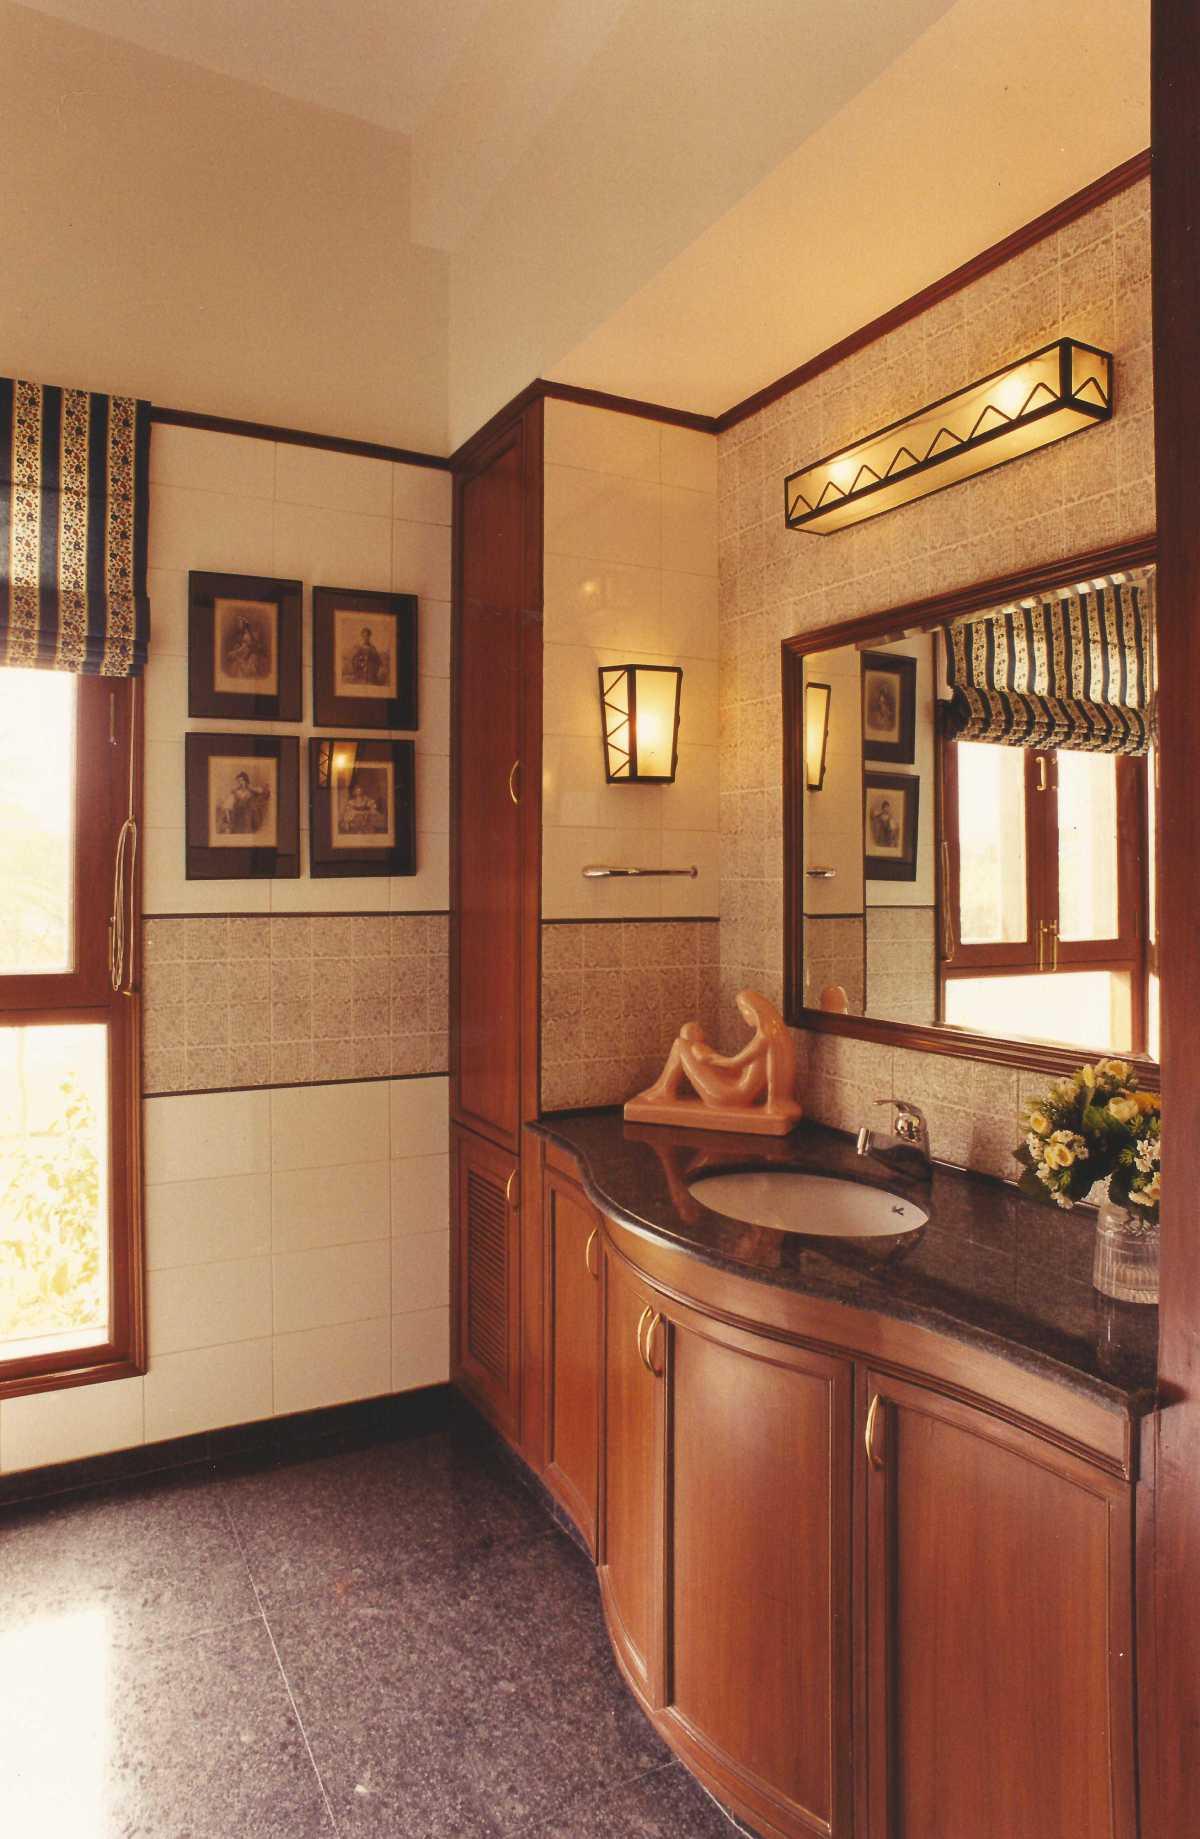 Turnkey Residential Interiors